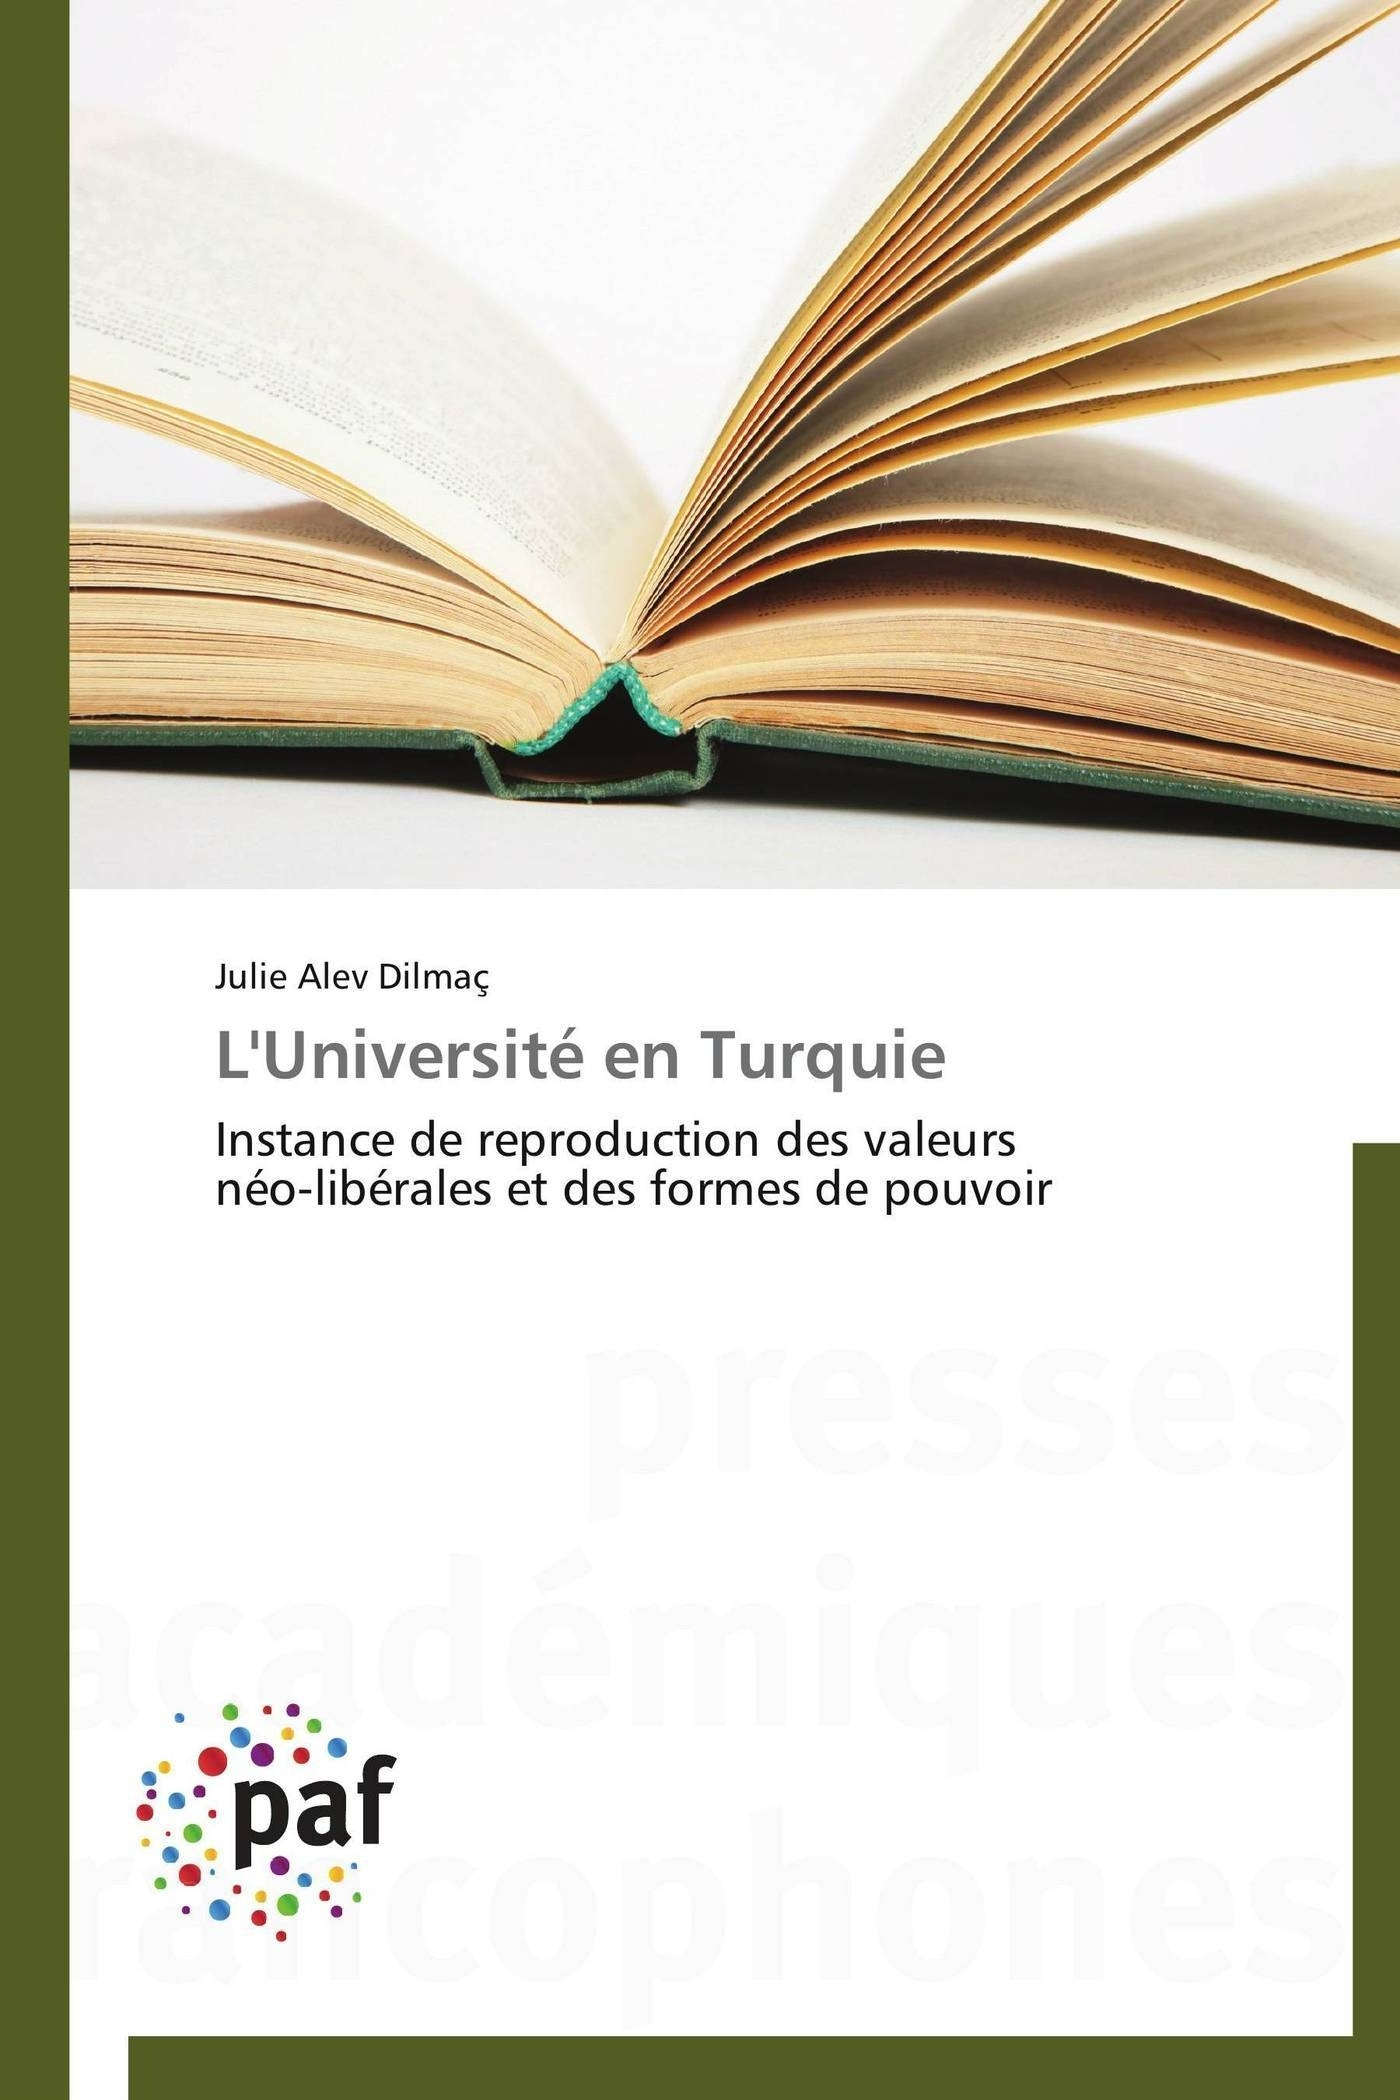 L'UNIVERSITE EN TURQUIE